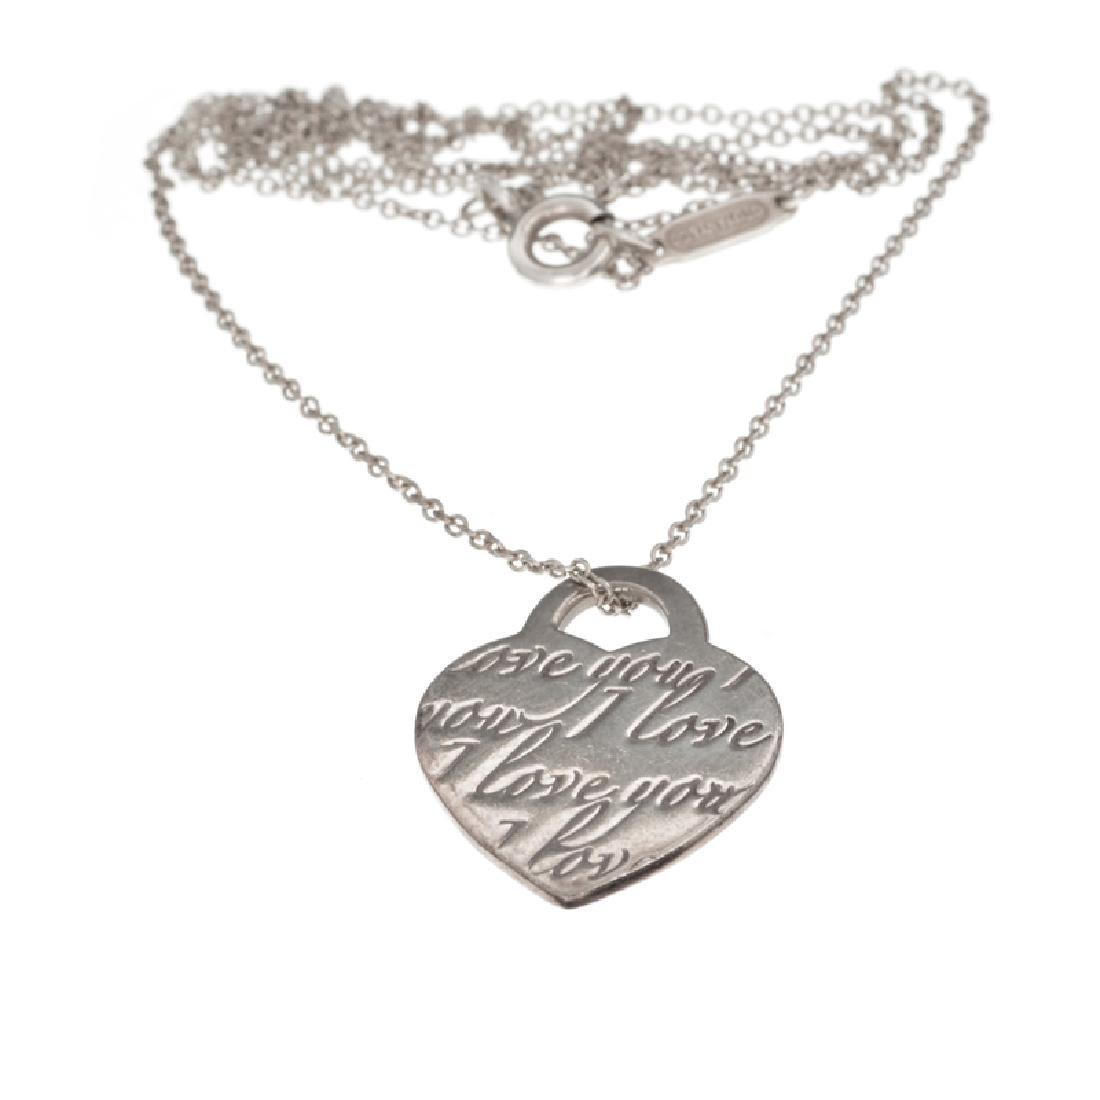 Fine Jewelry Rare Exquisite Tiffany & Co. Sterling